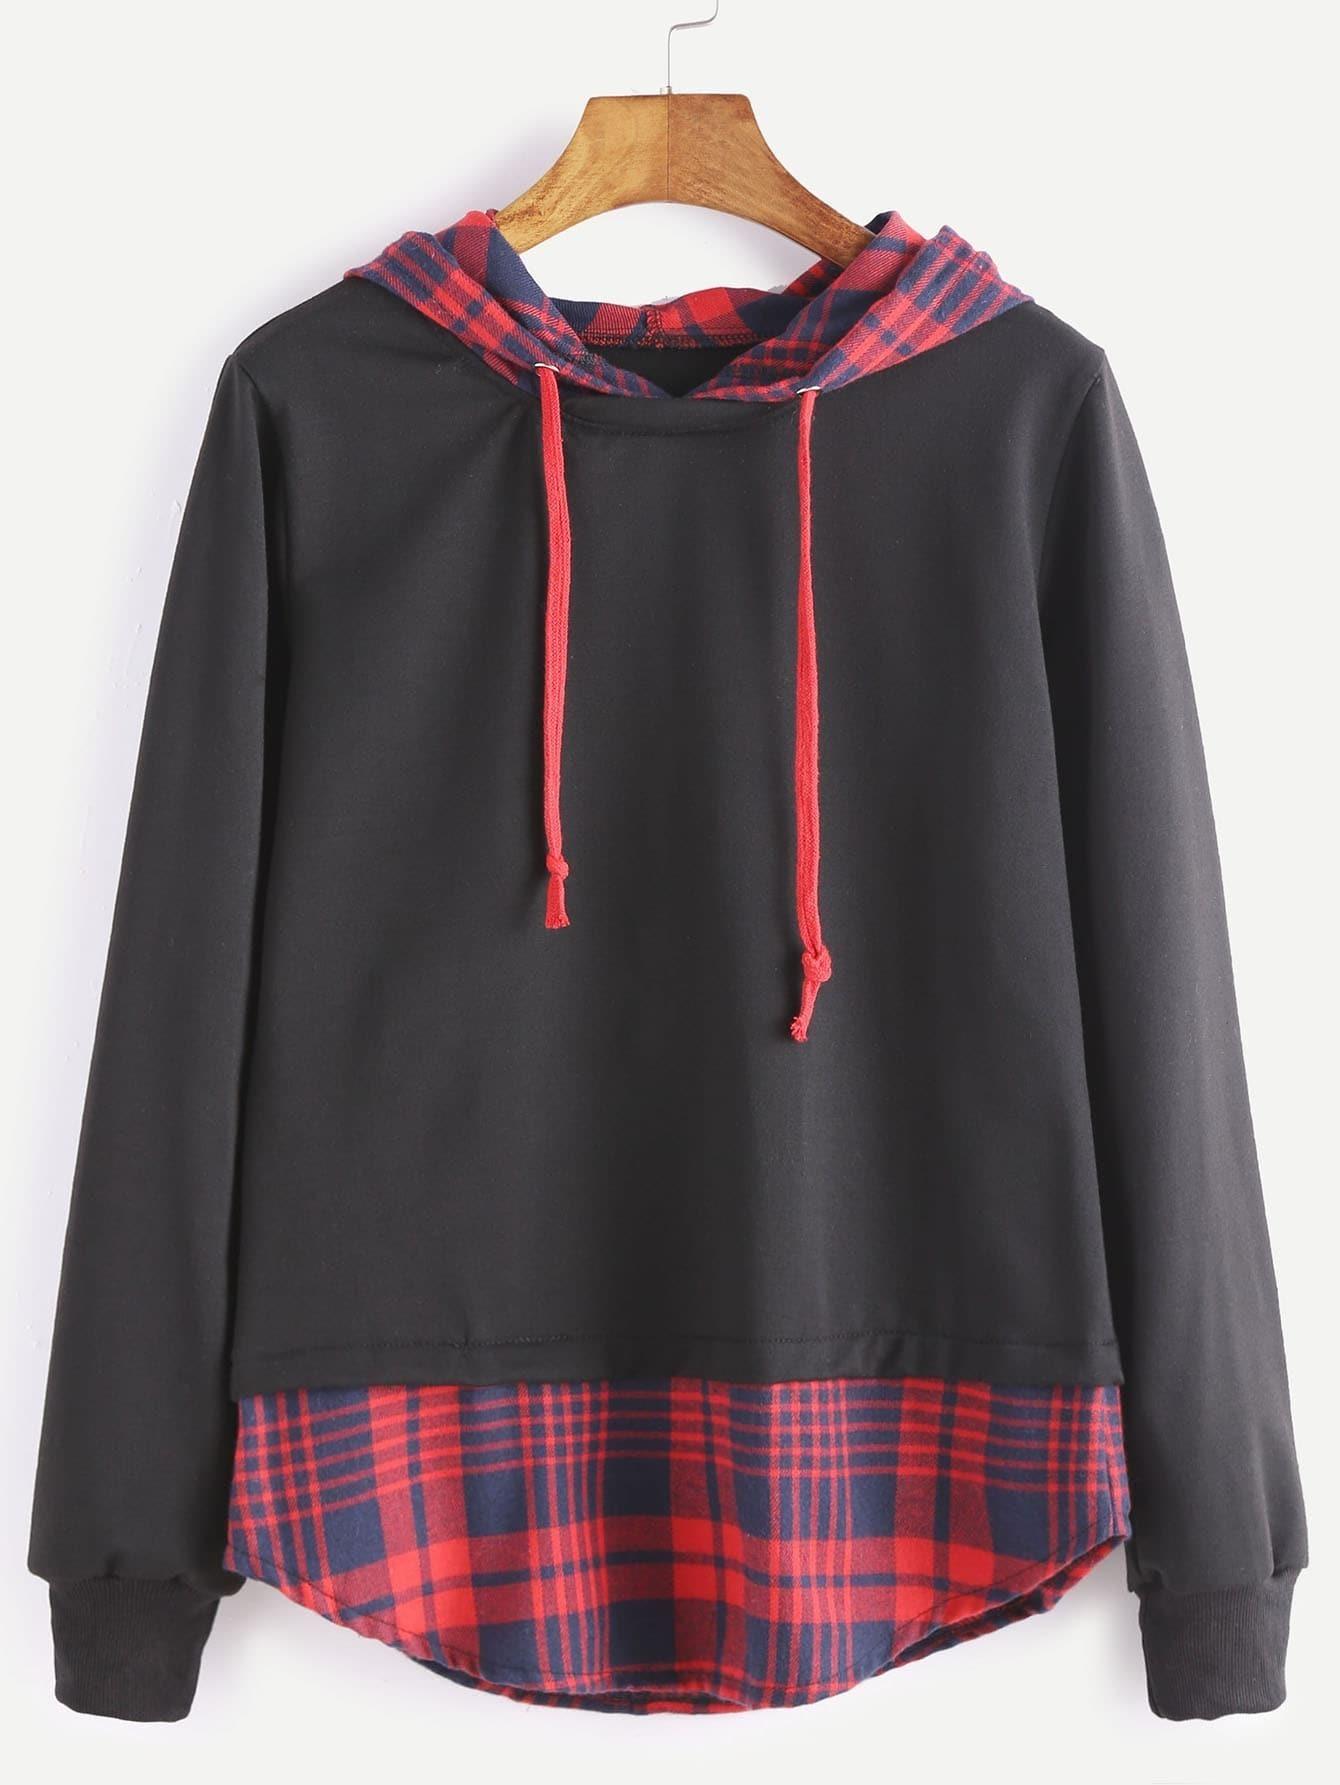 a573dea2b4d36 Black Hooded Contrast Plaid Hem 2 In 1 Sweatshirt EmmaCloth ...